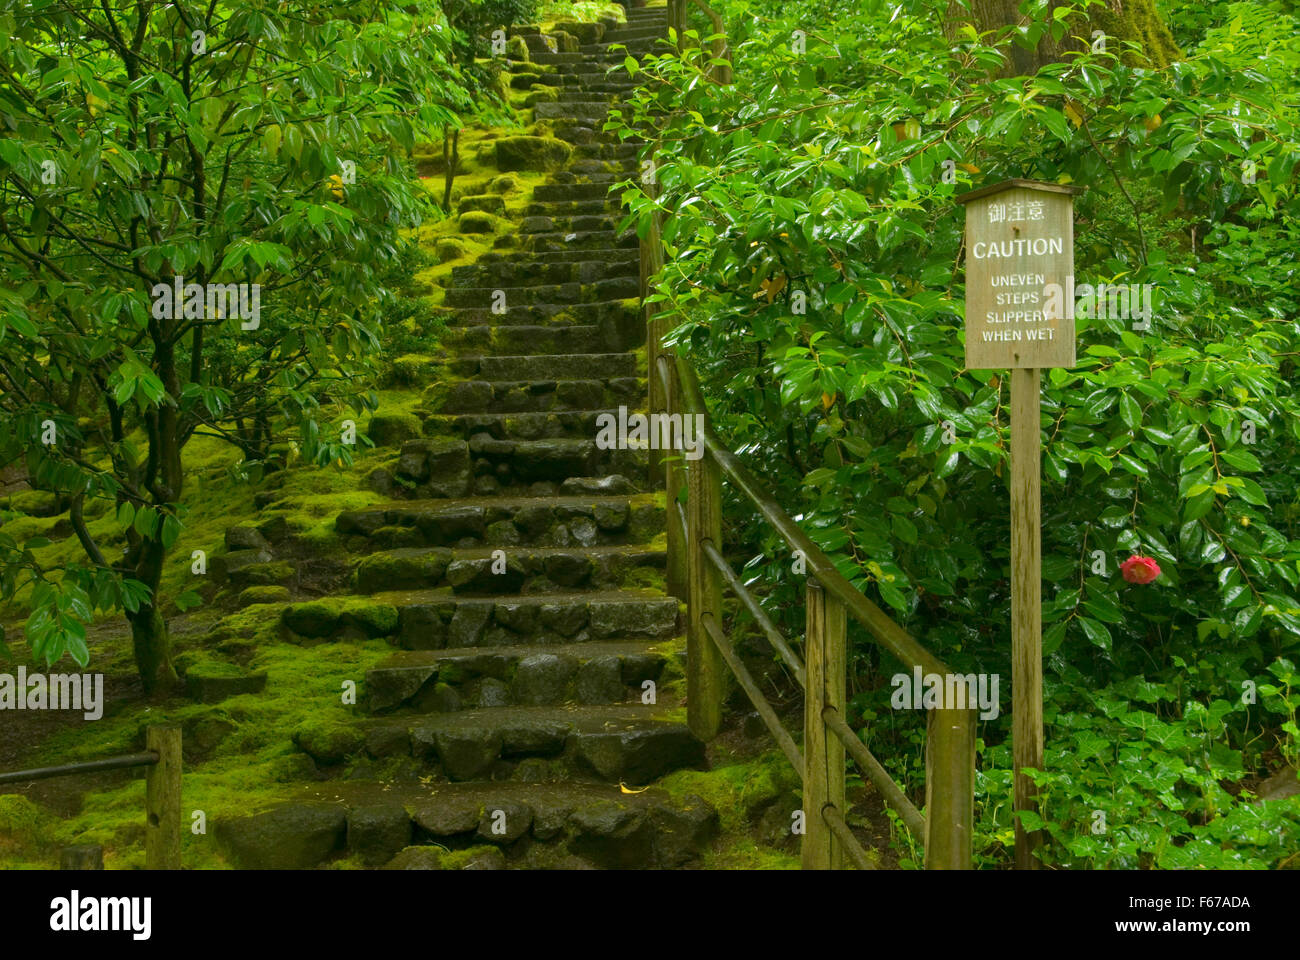 Natural Garden Stairway Portland Japanese Garden Washington Park Stock Photo Royalty Free